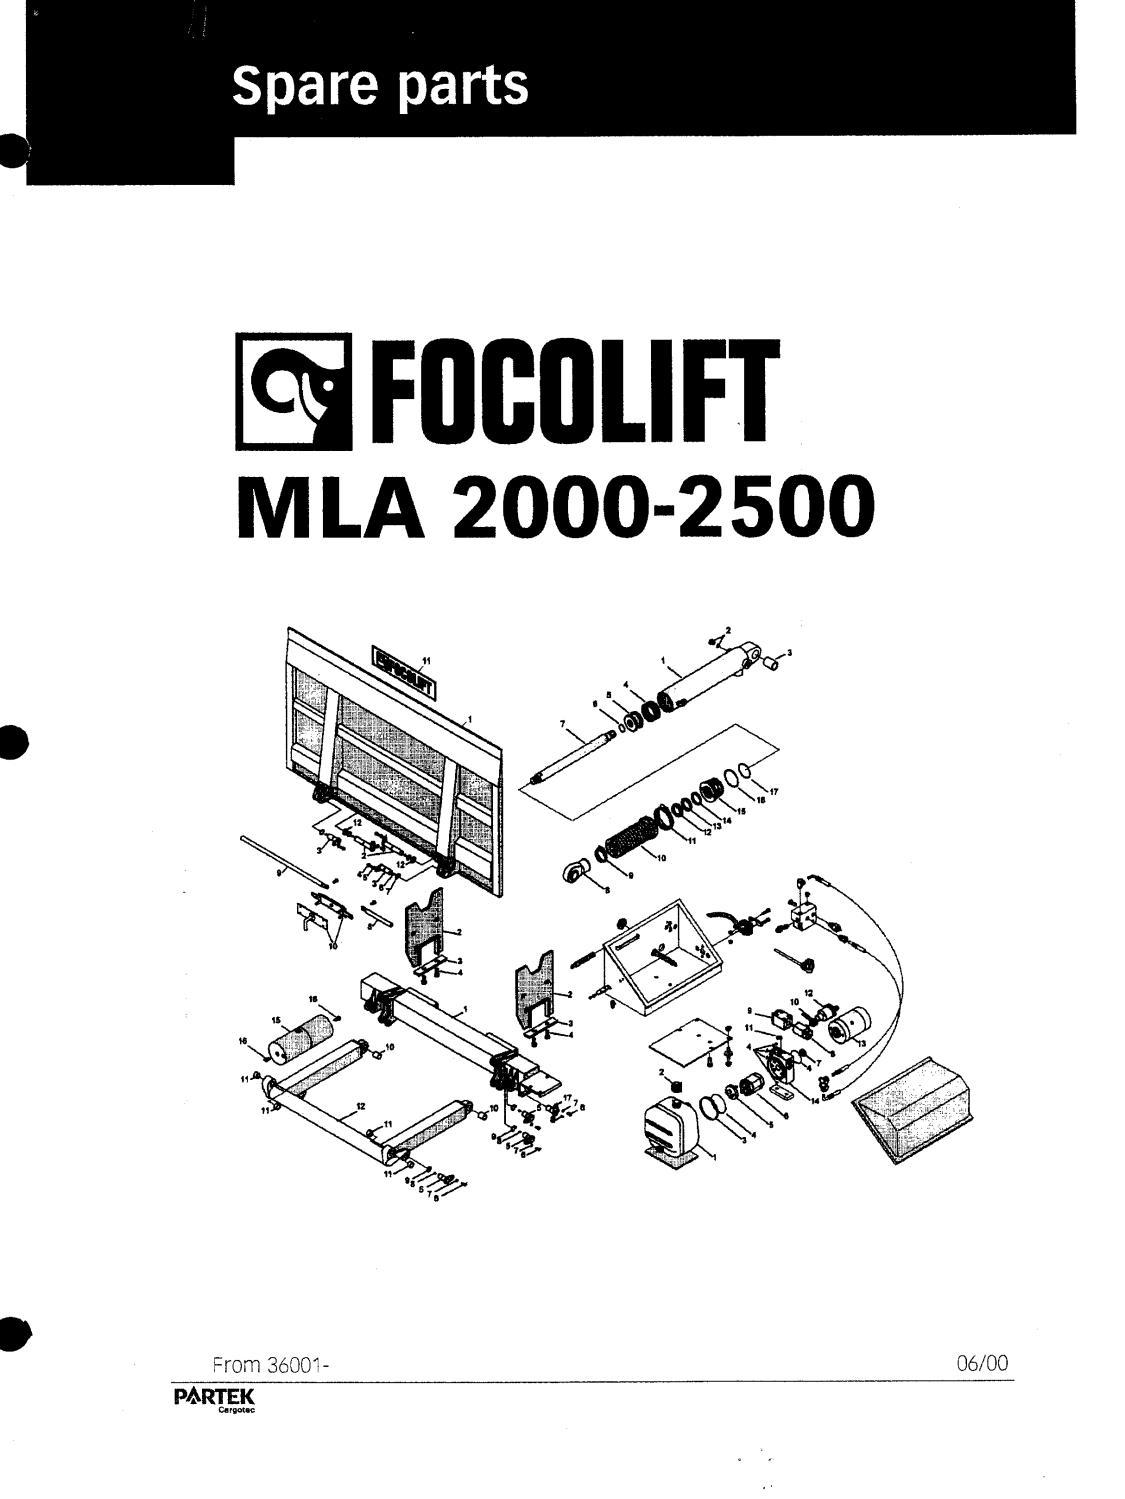 [DIAGRAM_0HG]  Leyman LVS 5500 Liftgate Parts Manual by THE Liftgate Parts Co. - issuu | Leyman Liftgate Wiring Diagram |  | Issuu